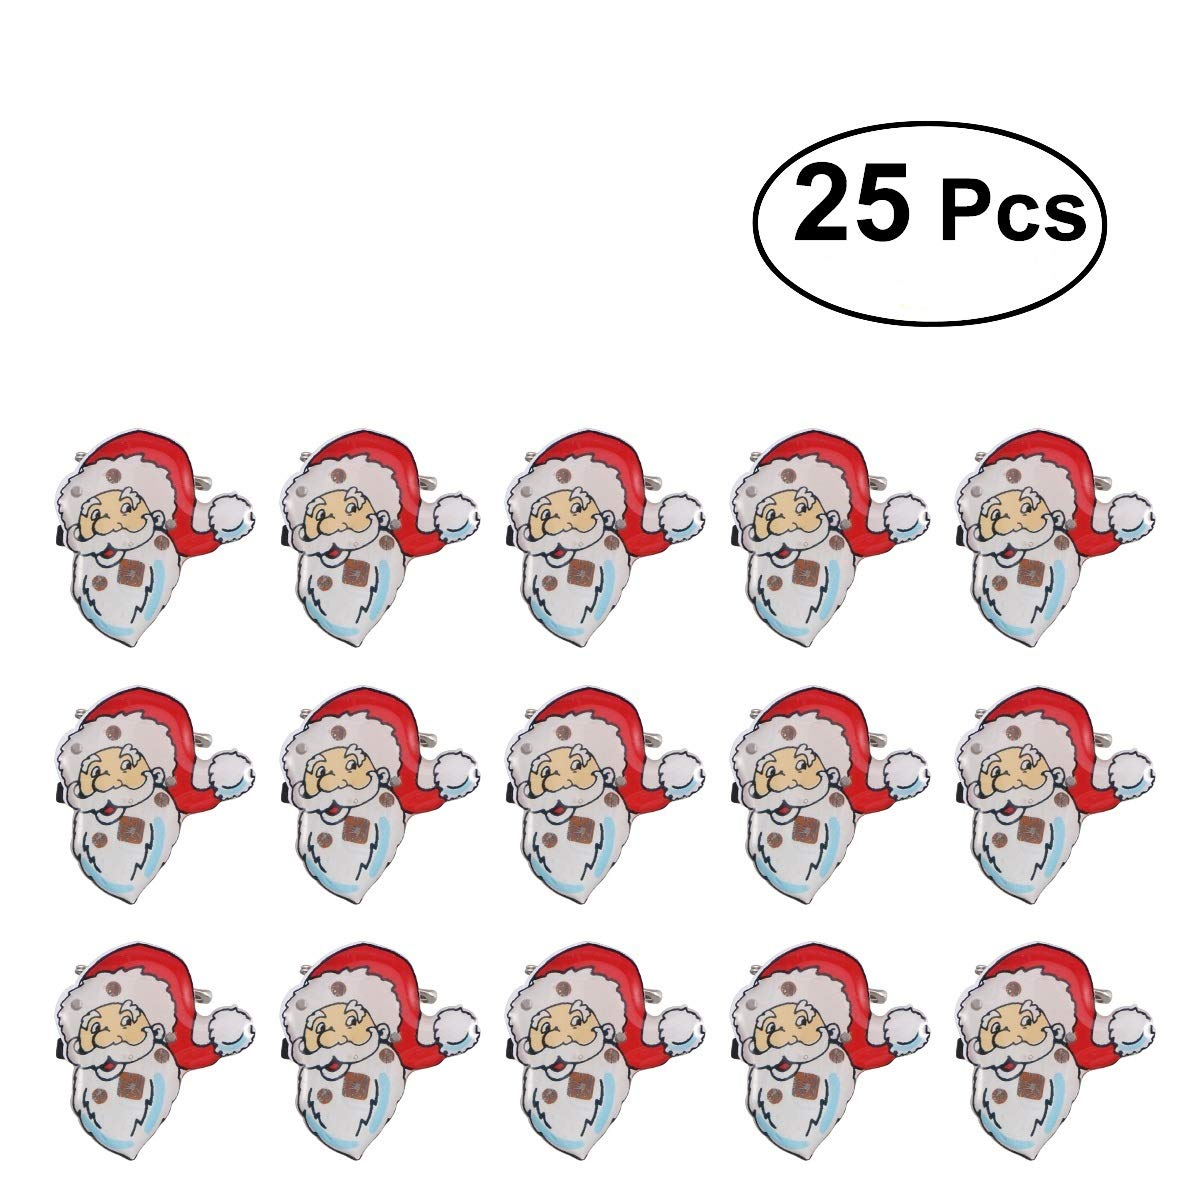 BESTOYARD LED Brooch Christmas Brooch Pin Santa Claus Badge Brooch Children Gift Party Favors 25Pcs SG/_B075FSM3GY/_US